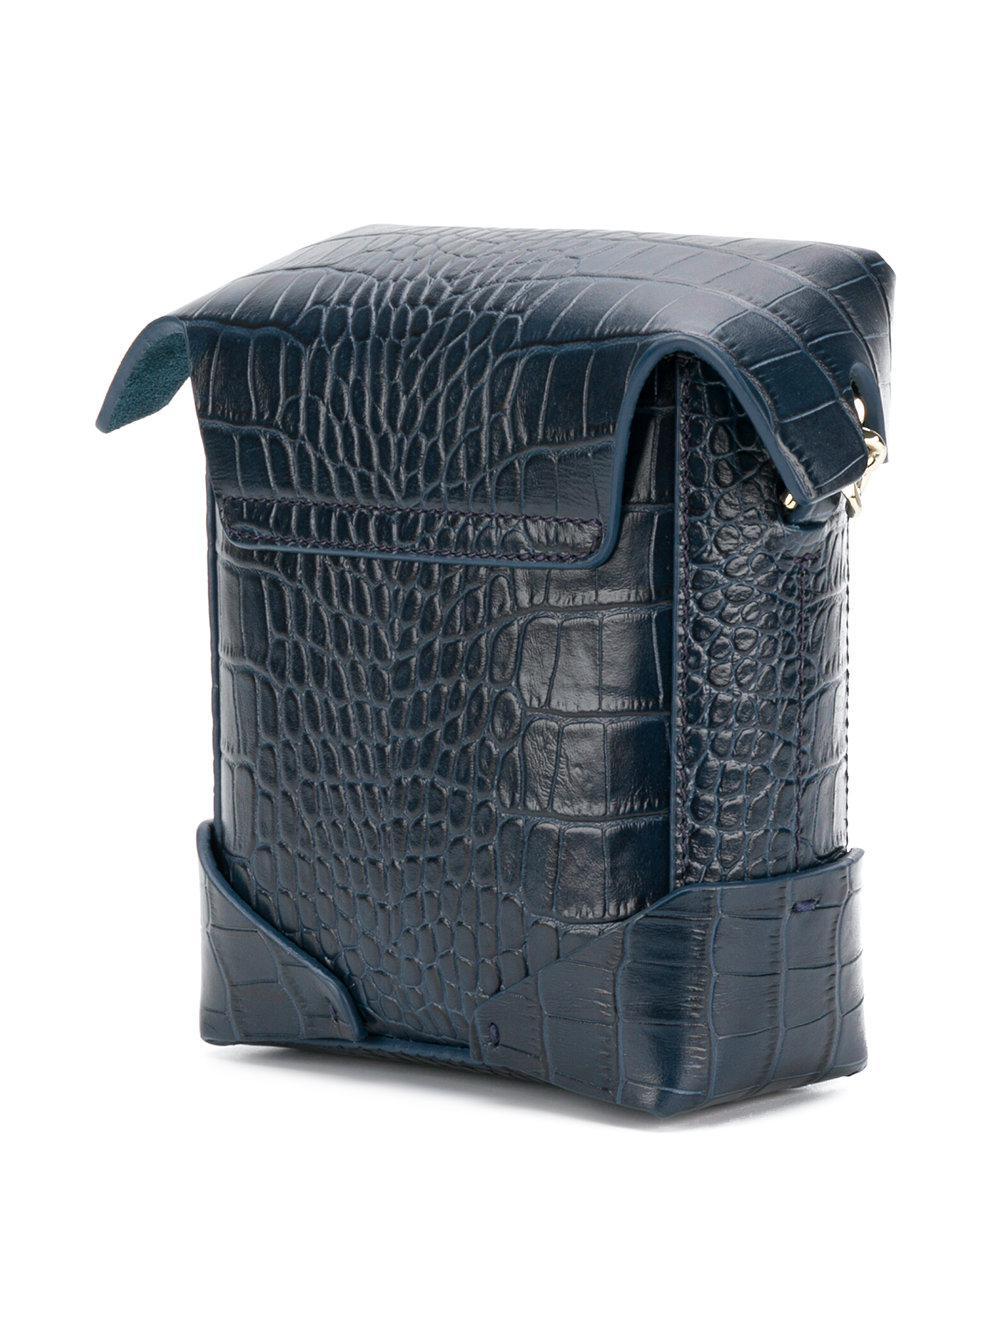 MANU Atelier Leather Micro Pristine Cross Body Bag in Blue